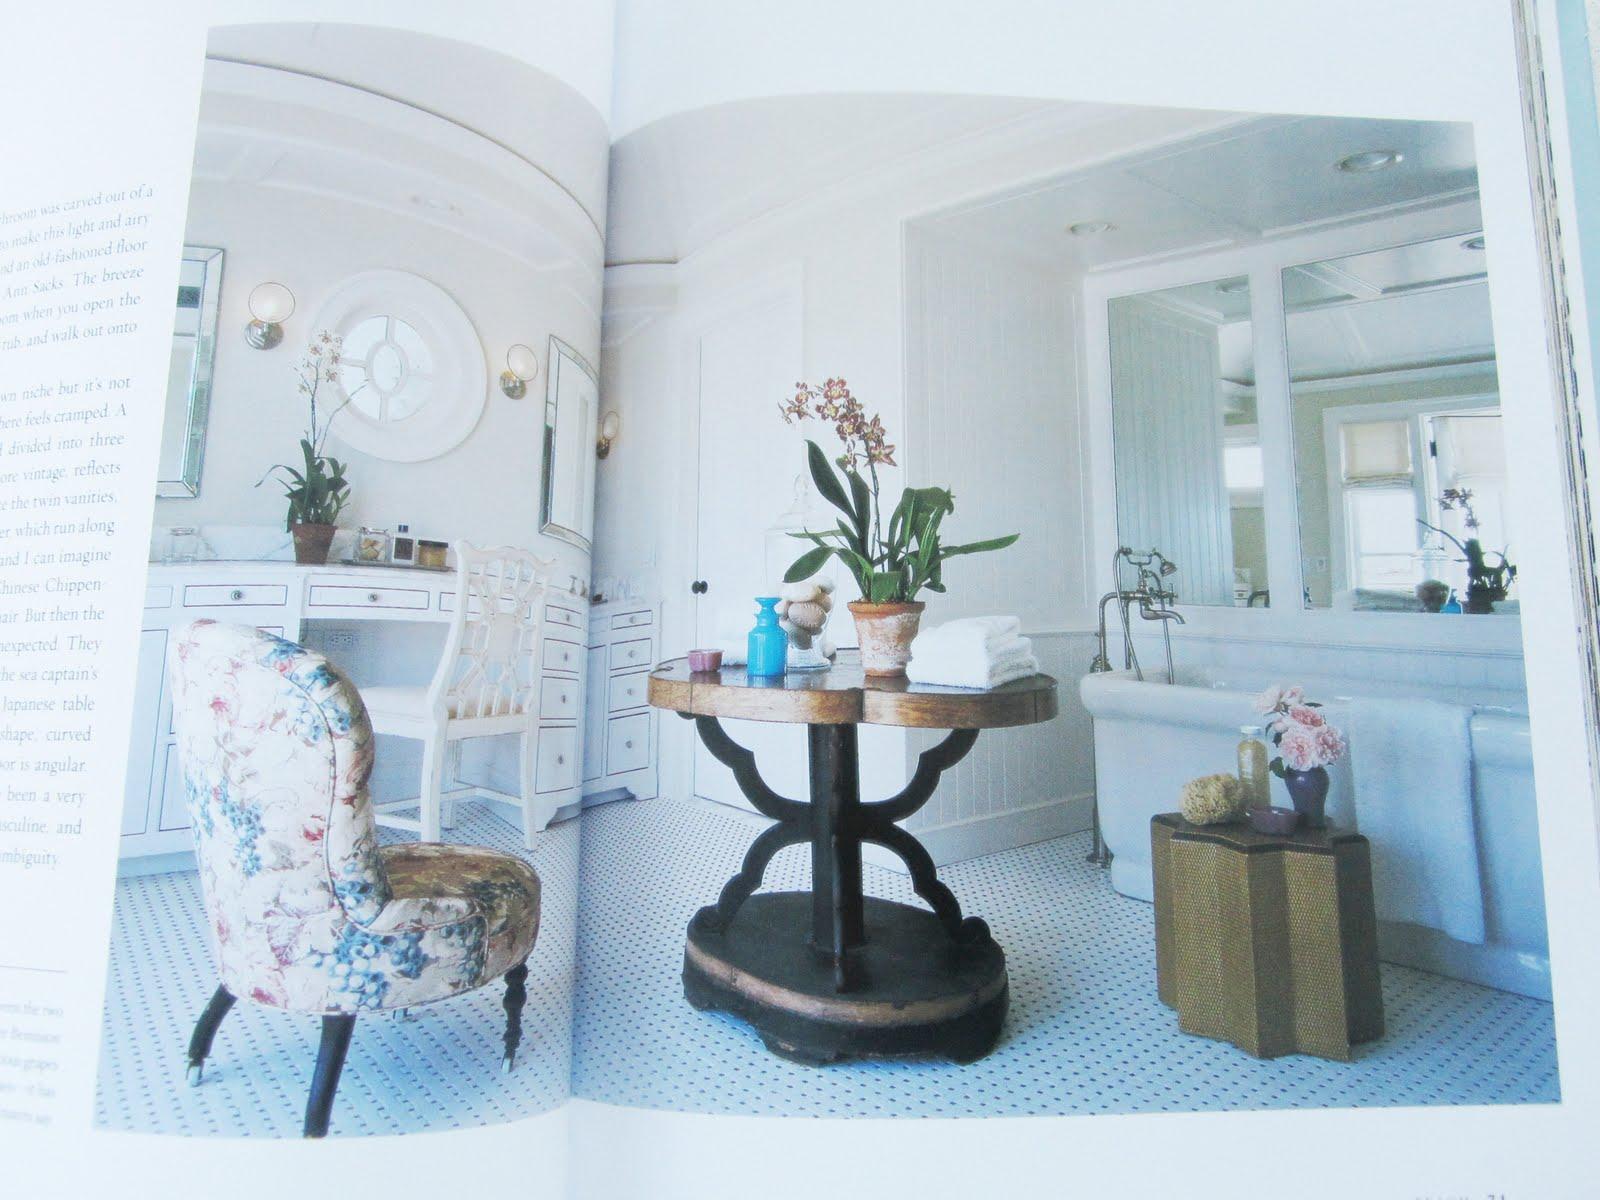 Fine Japanese Sitting Tub Pattern - Bathtub Design Ideas - klotsnet.com